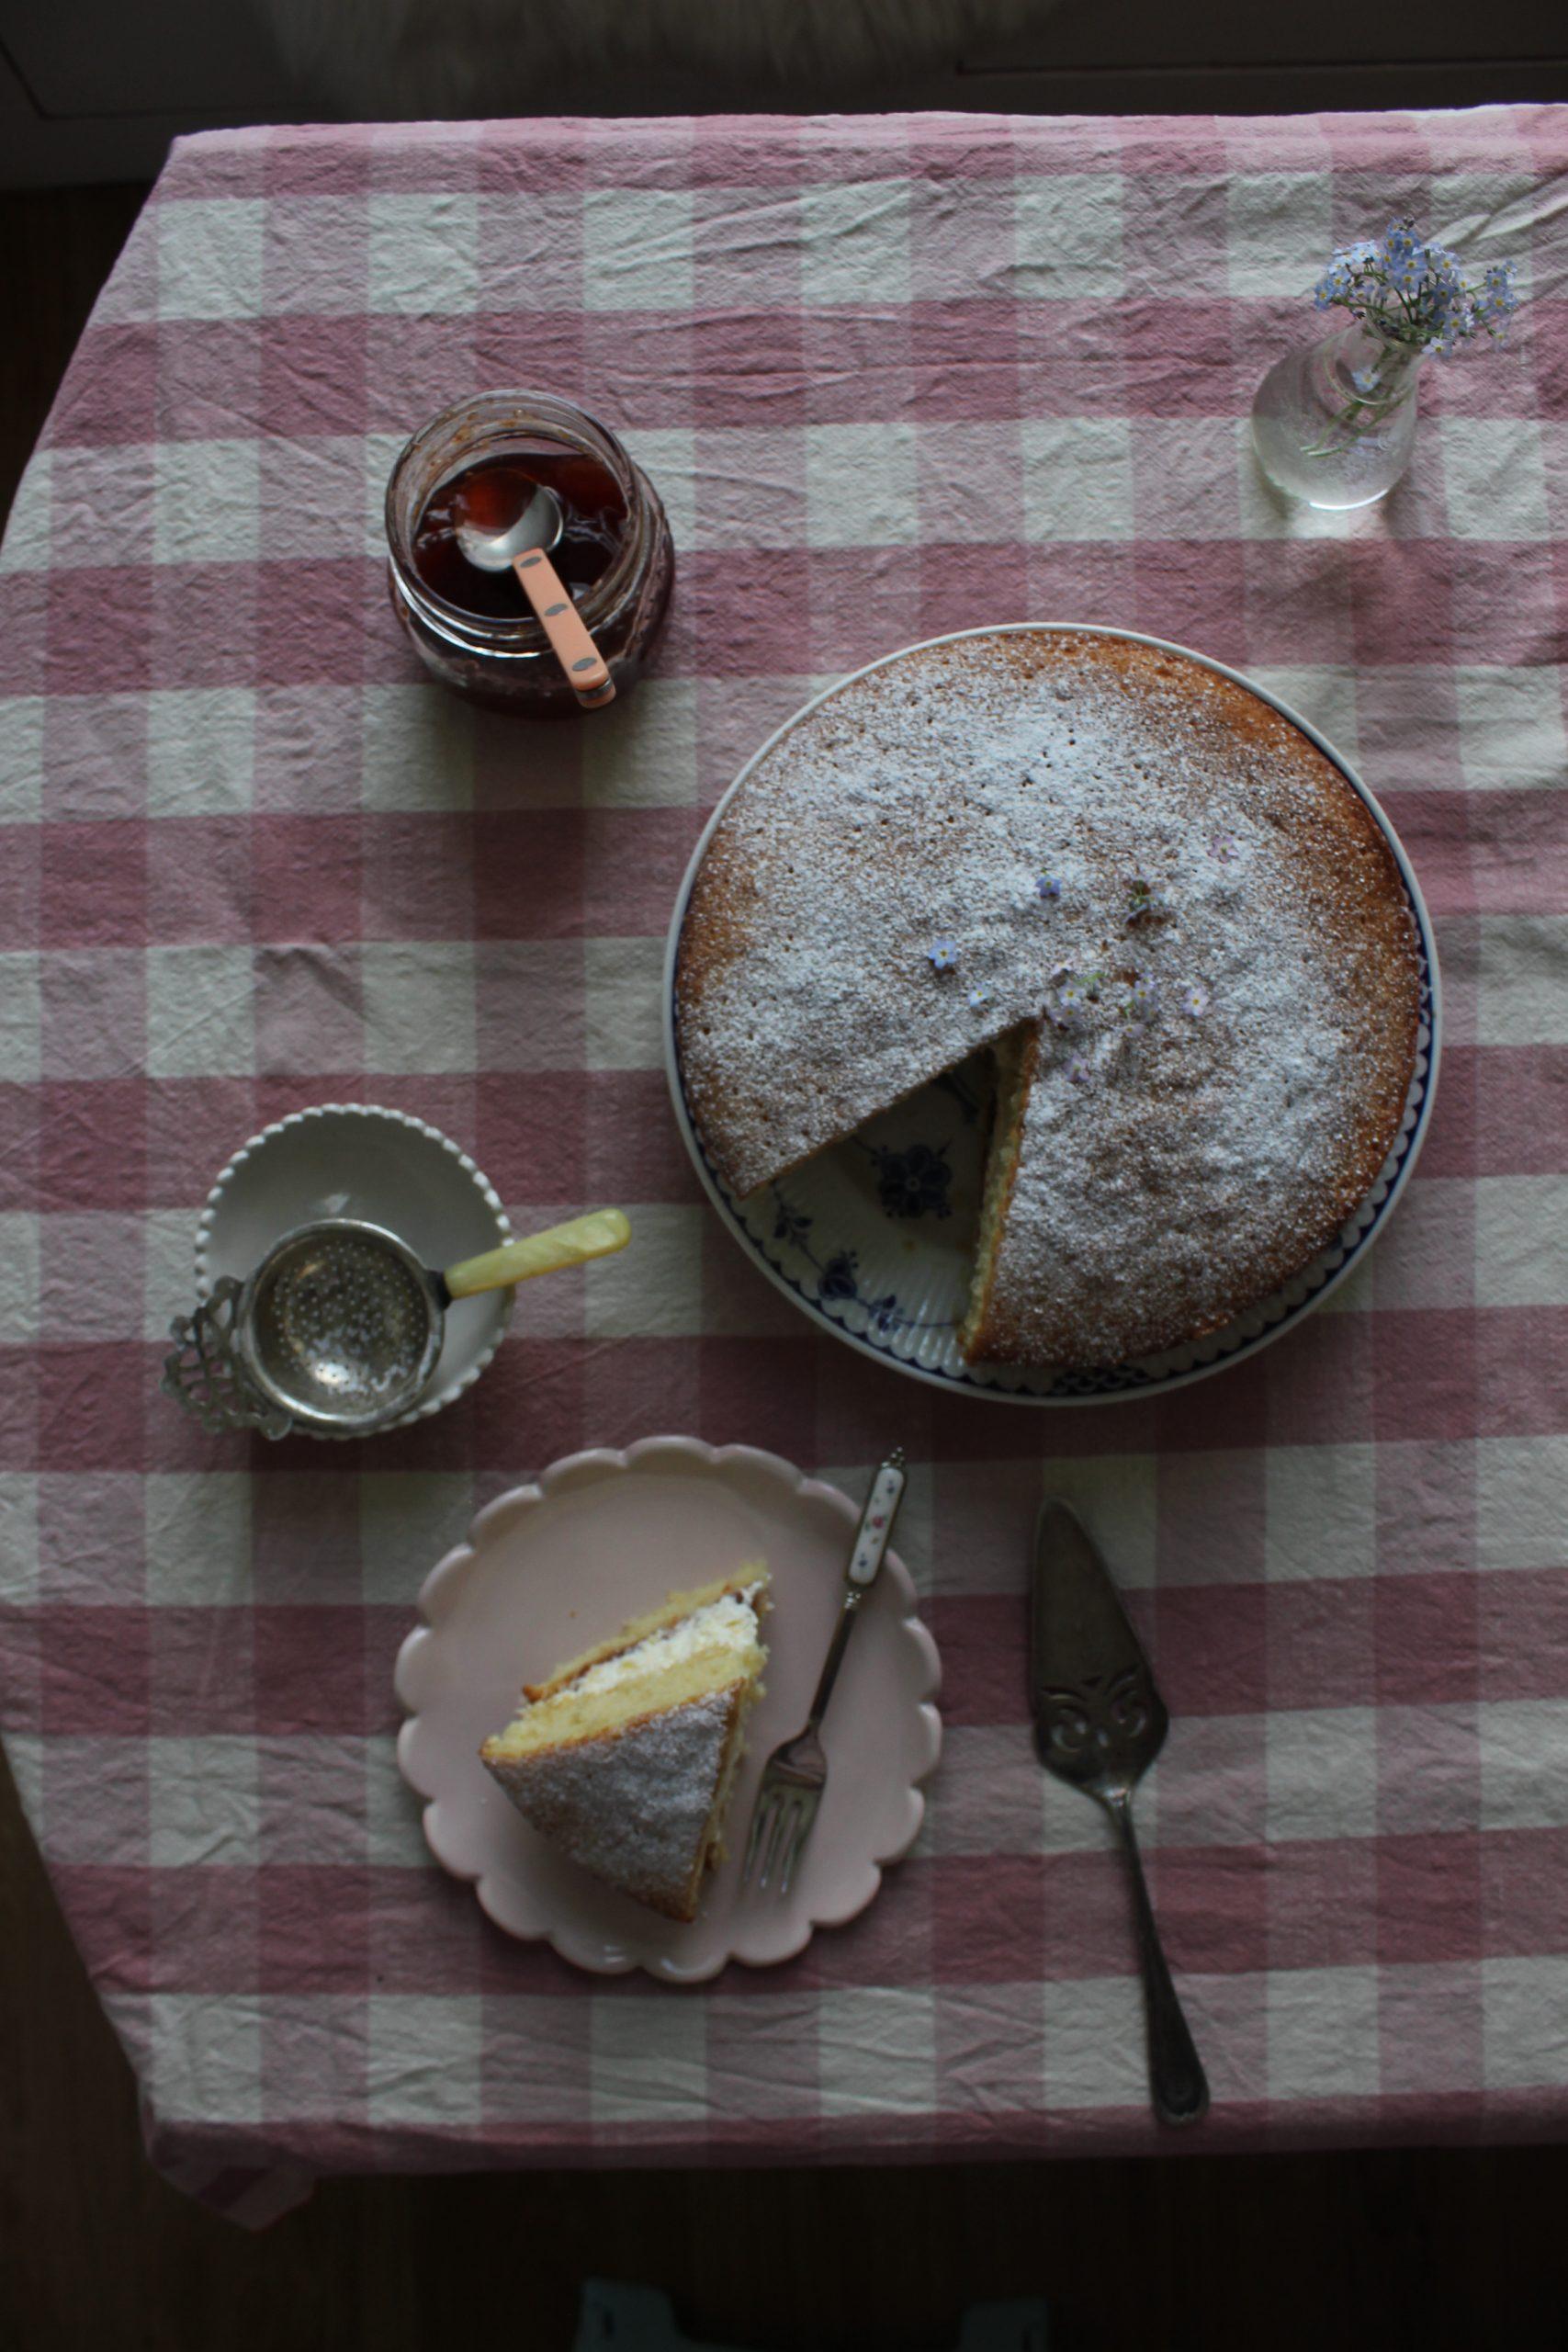 Strawberry and Elderflower Victoria sponge